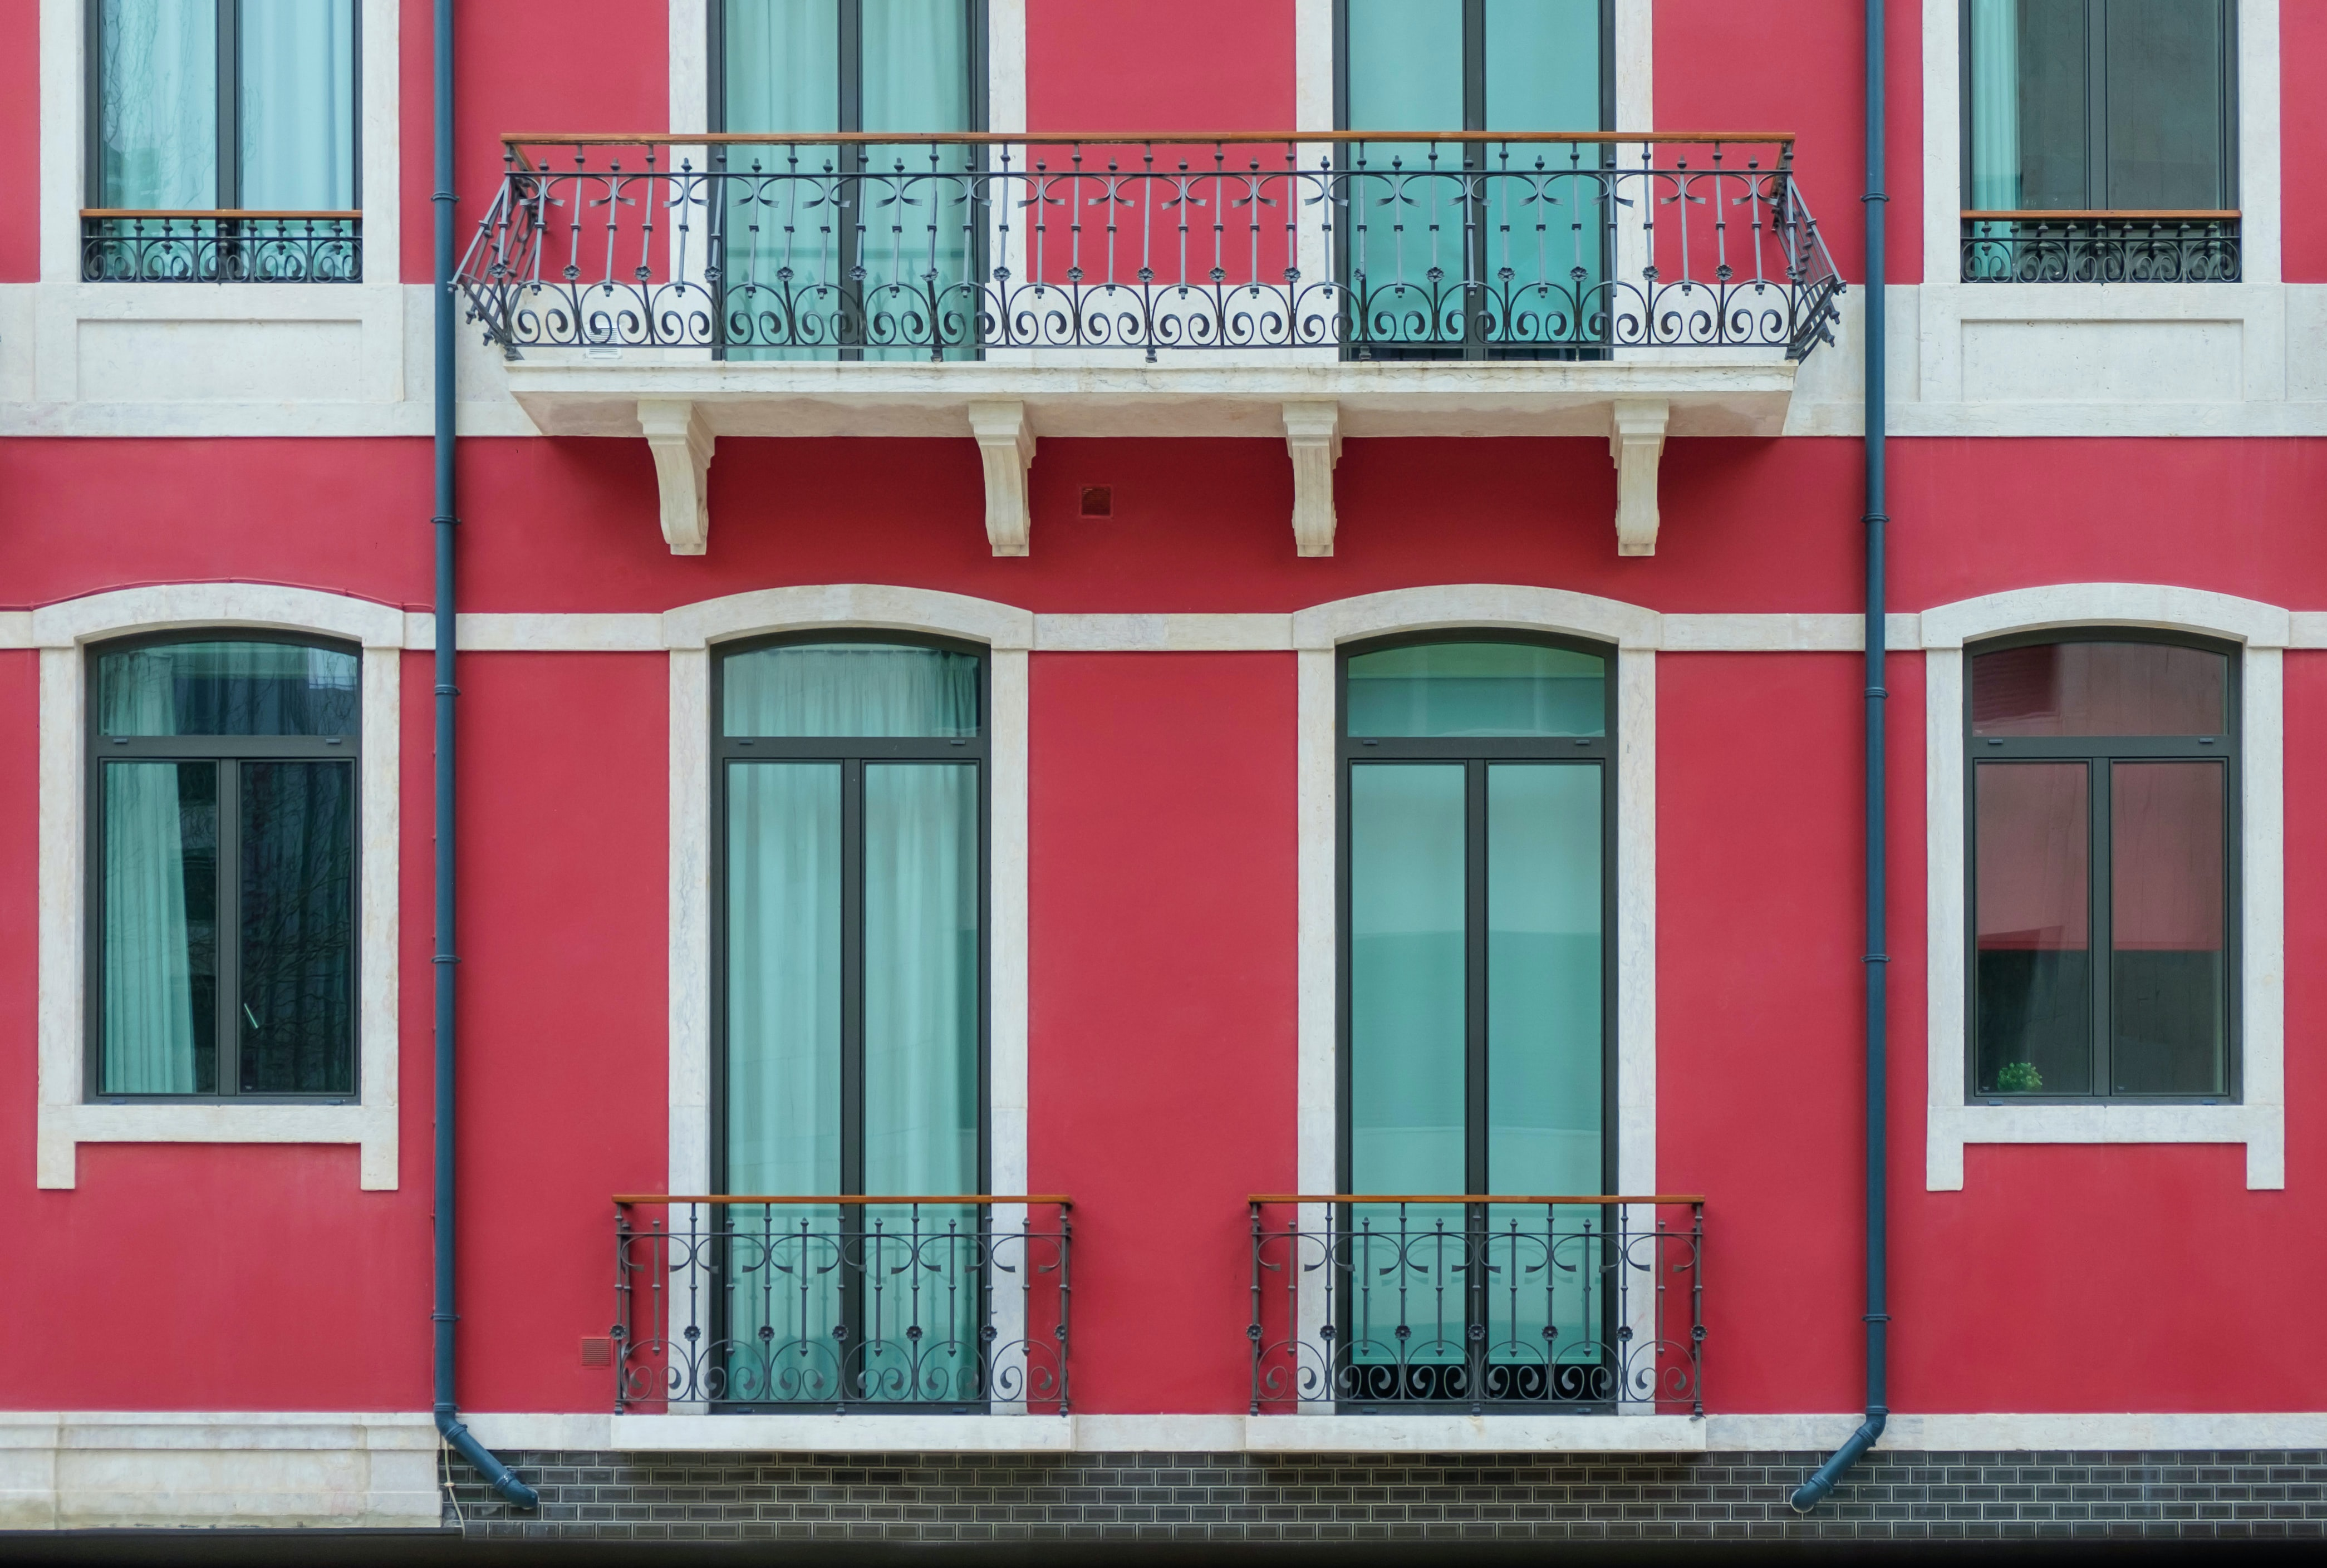 Photo by Glauco Zuccaccia on Unsplash